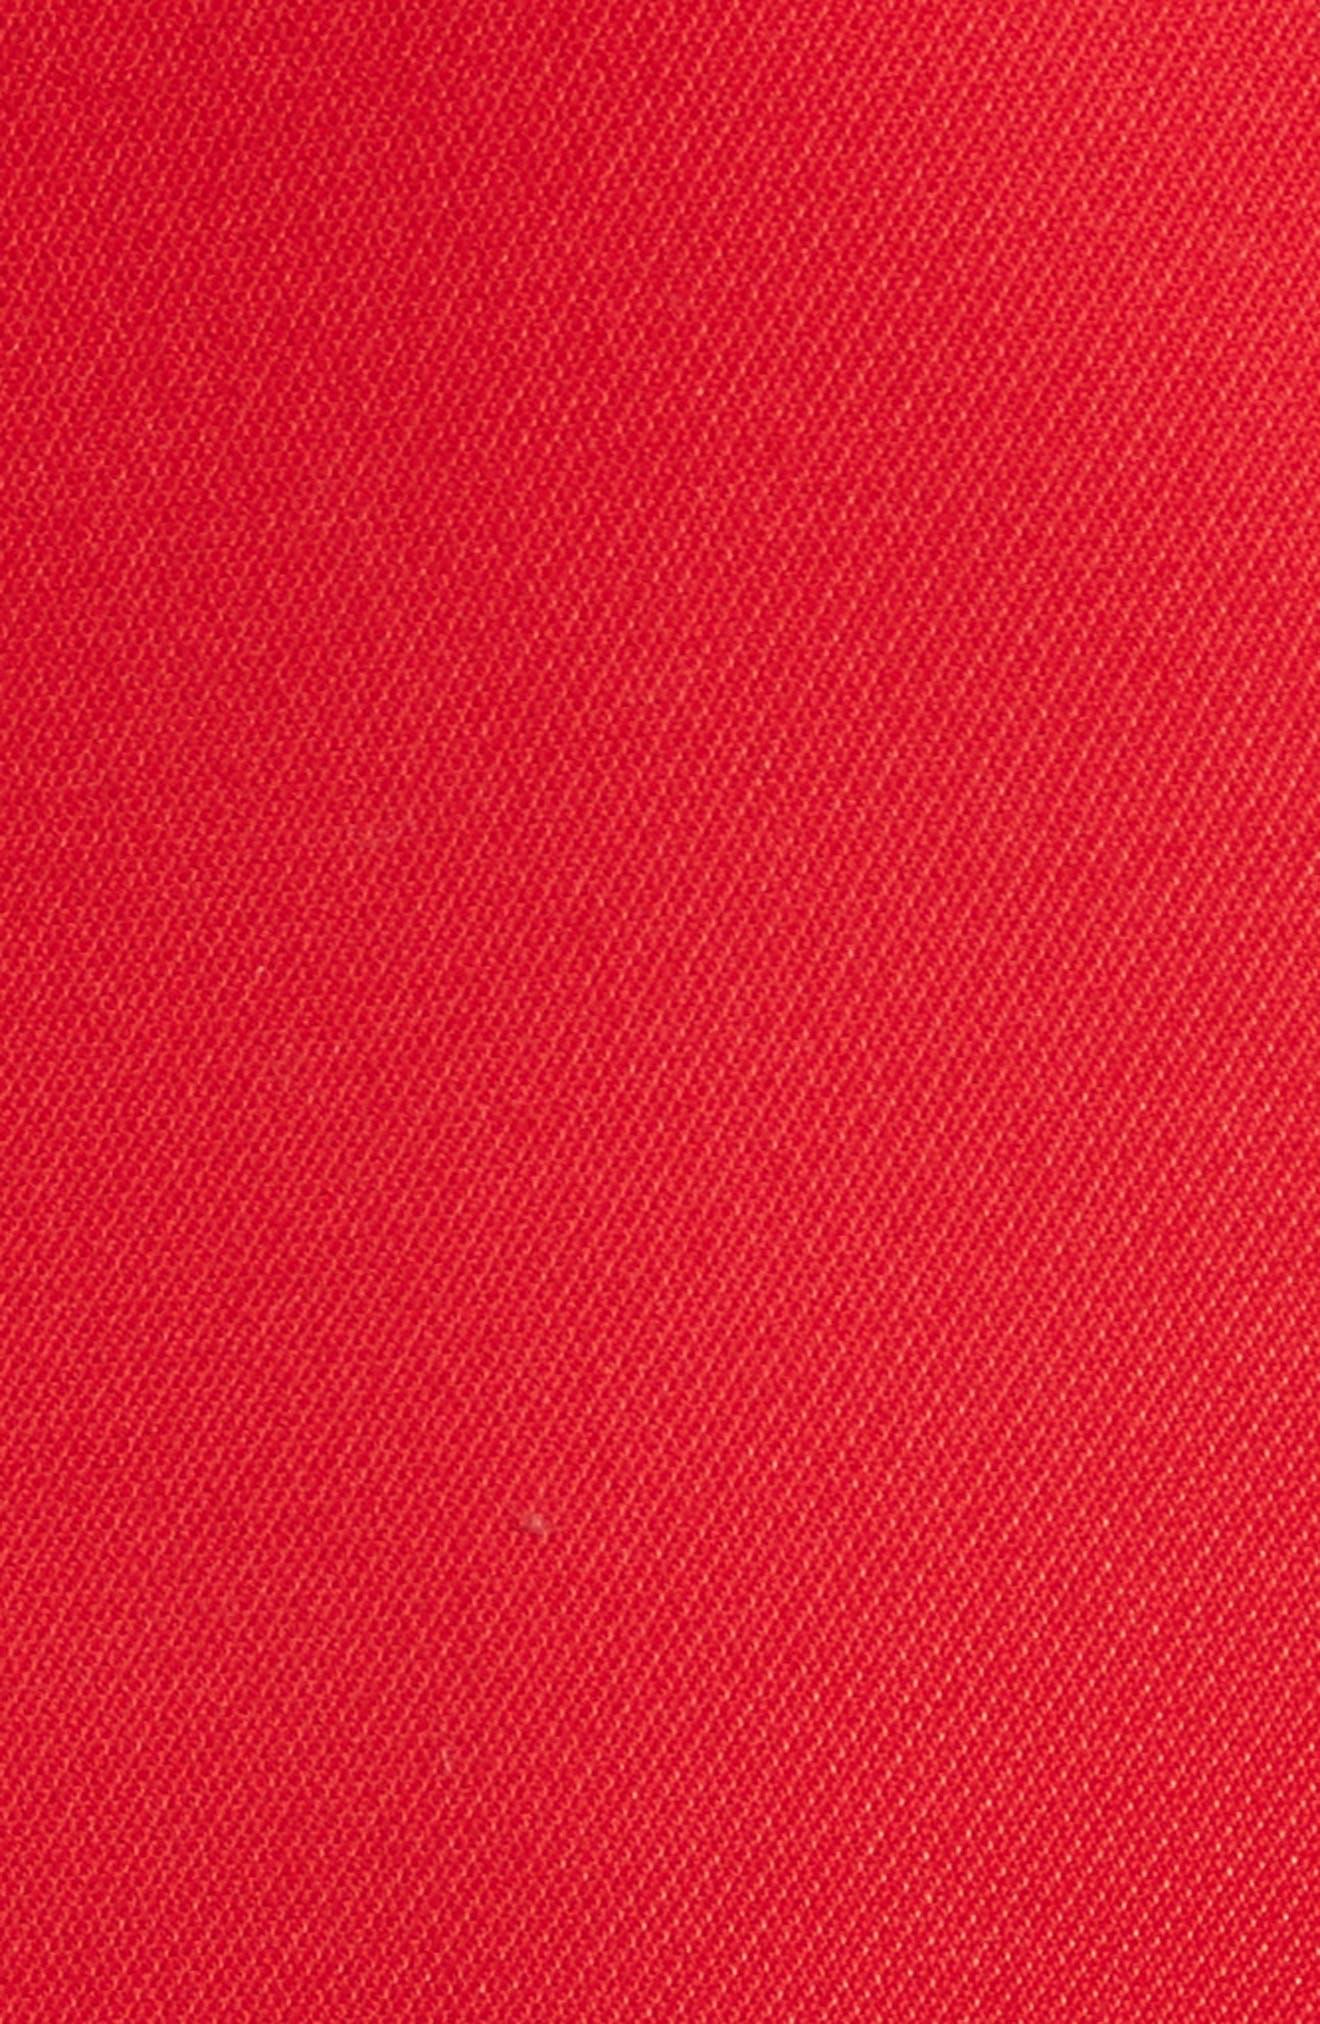 Open Stripe Fit & Flare Dress,                             Alternate thumbnail 5, color,                             610